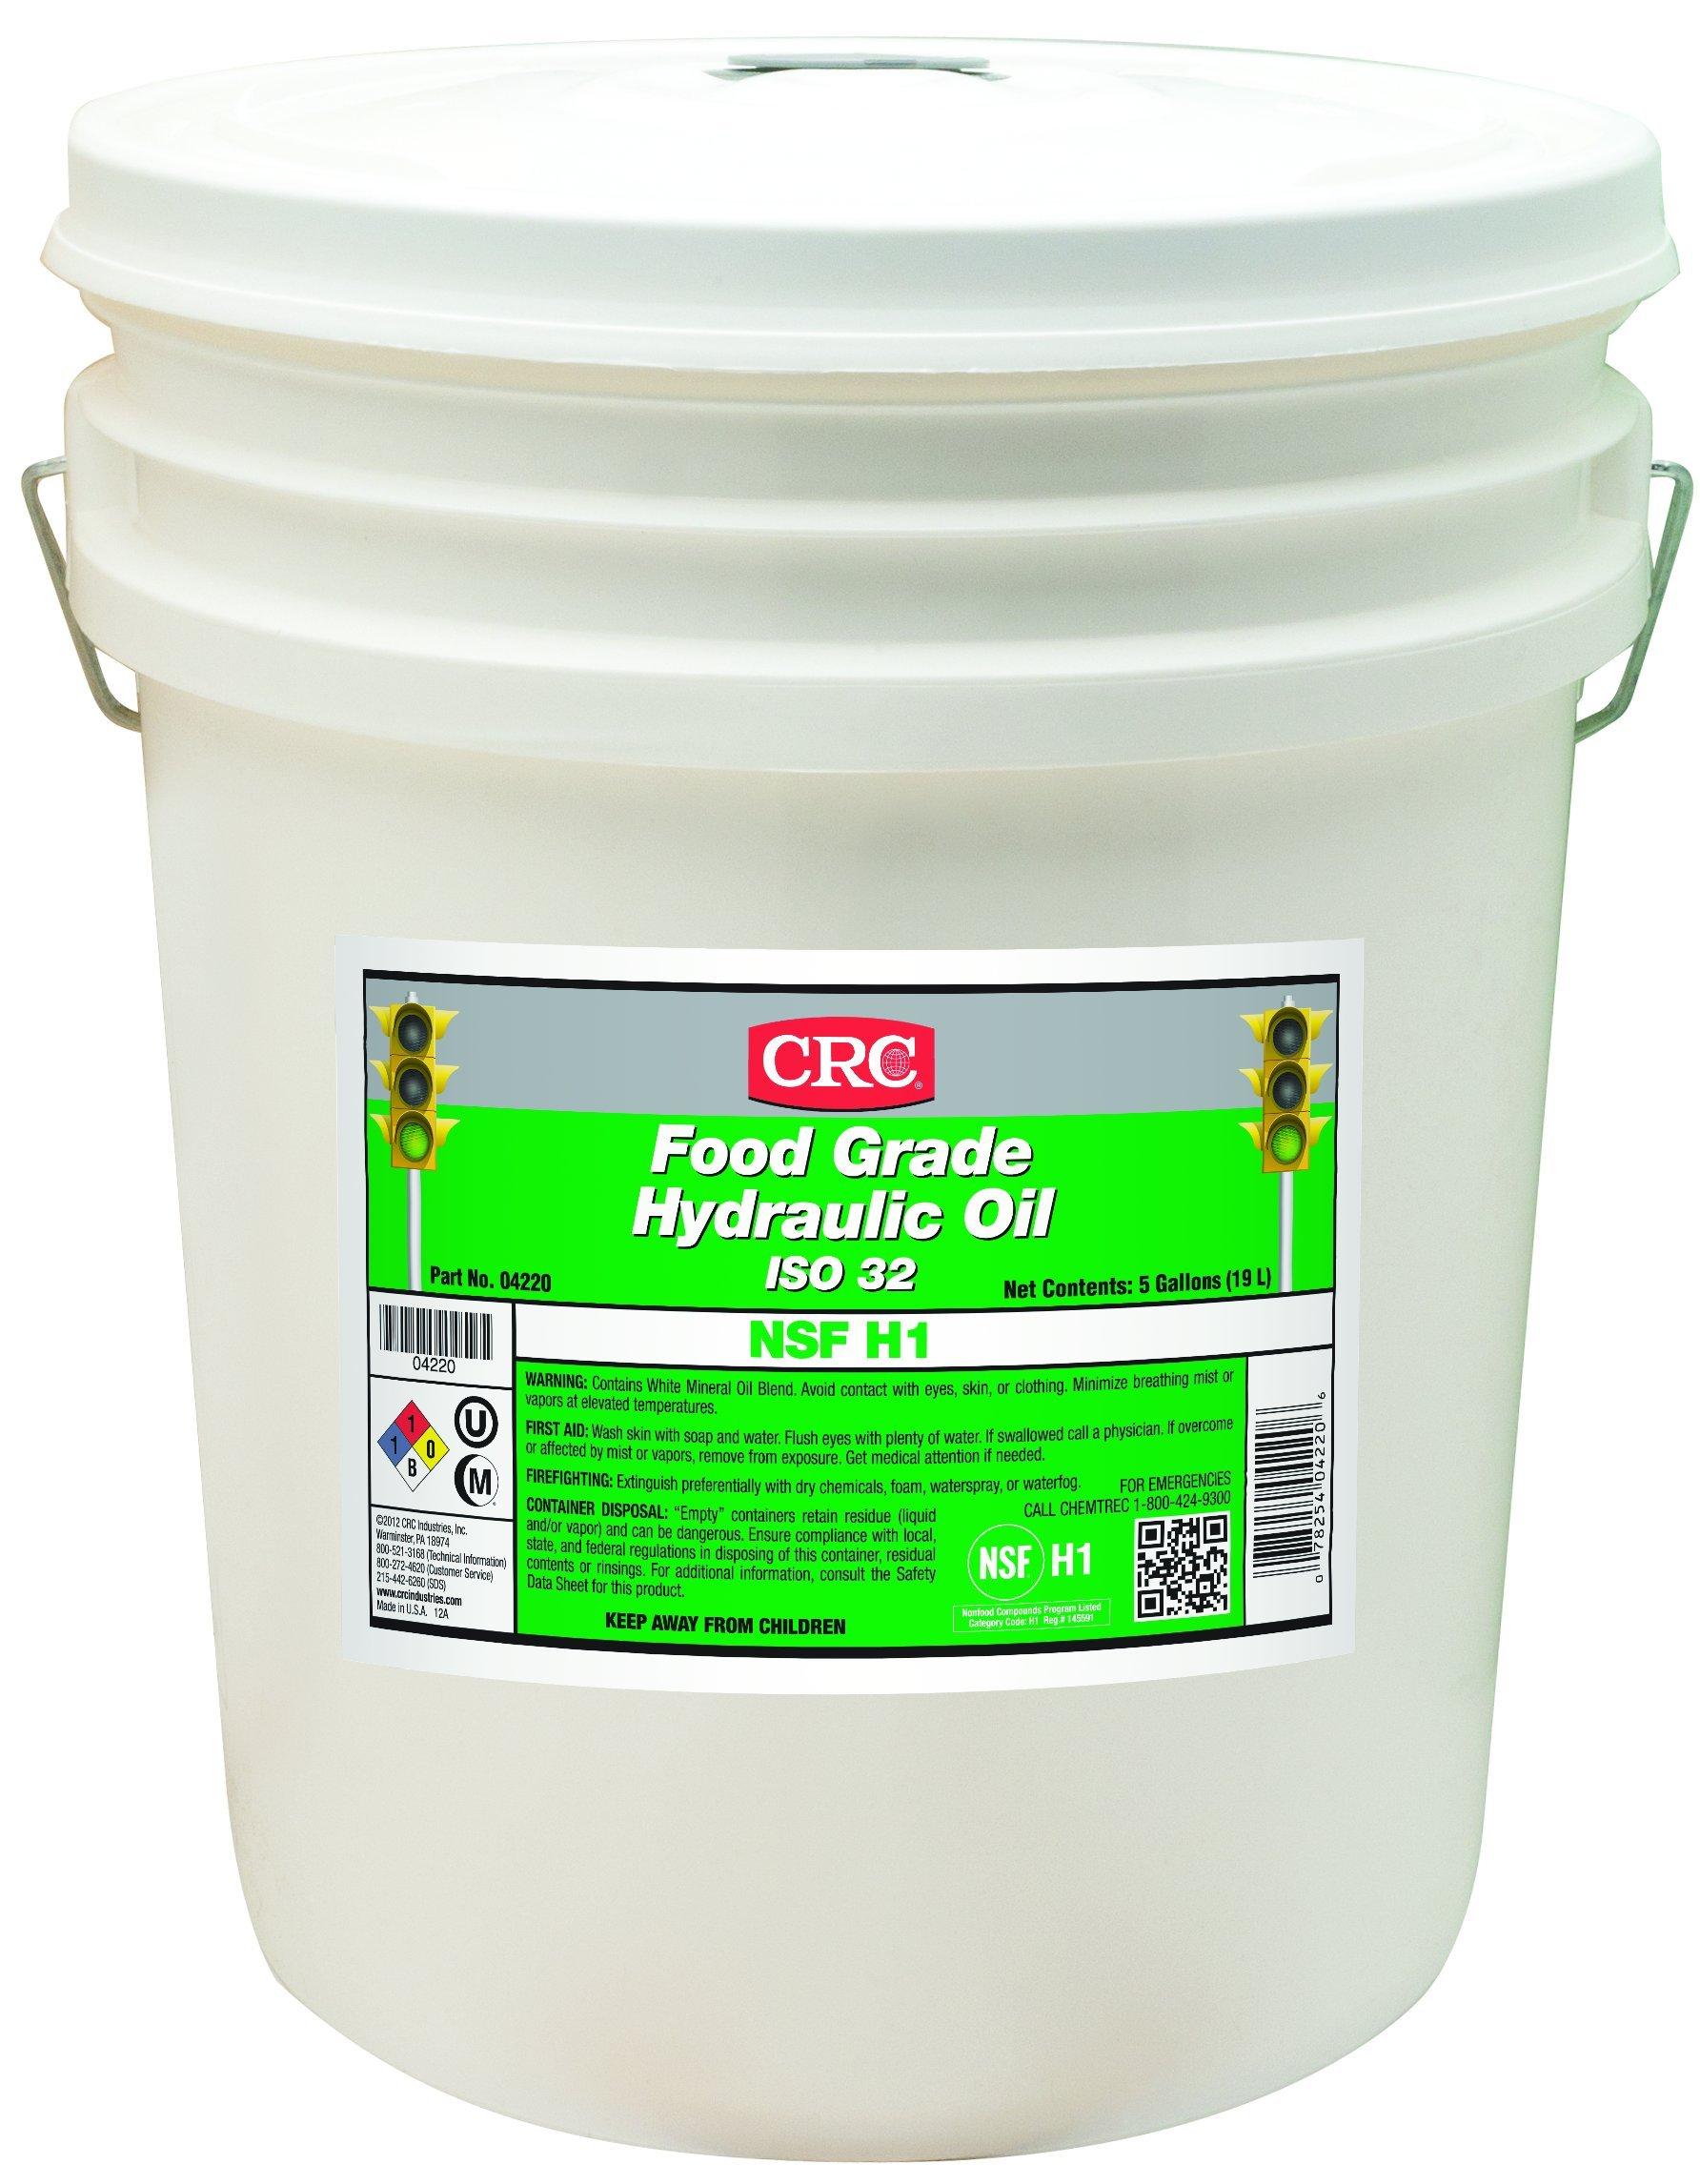 CRC Food Grade Hydraulic Oil, -10 to 325 Degrees F Temperature Range, 5 Gallon Pail, ISO 32